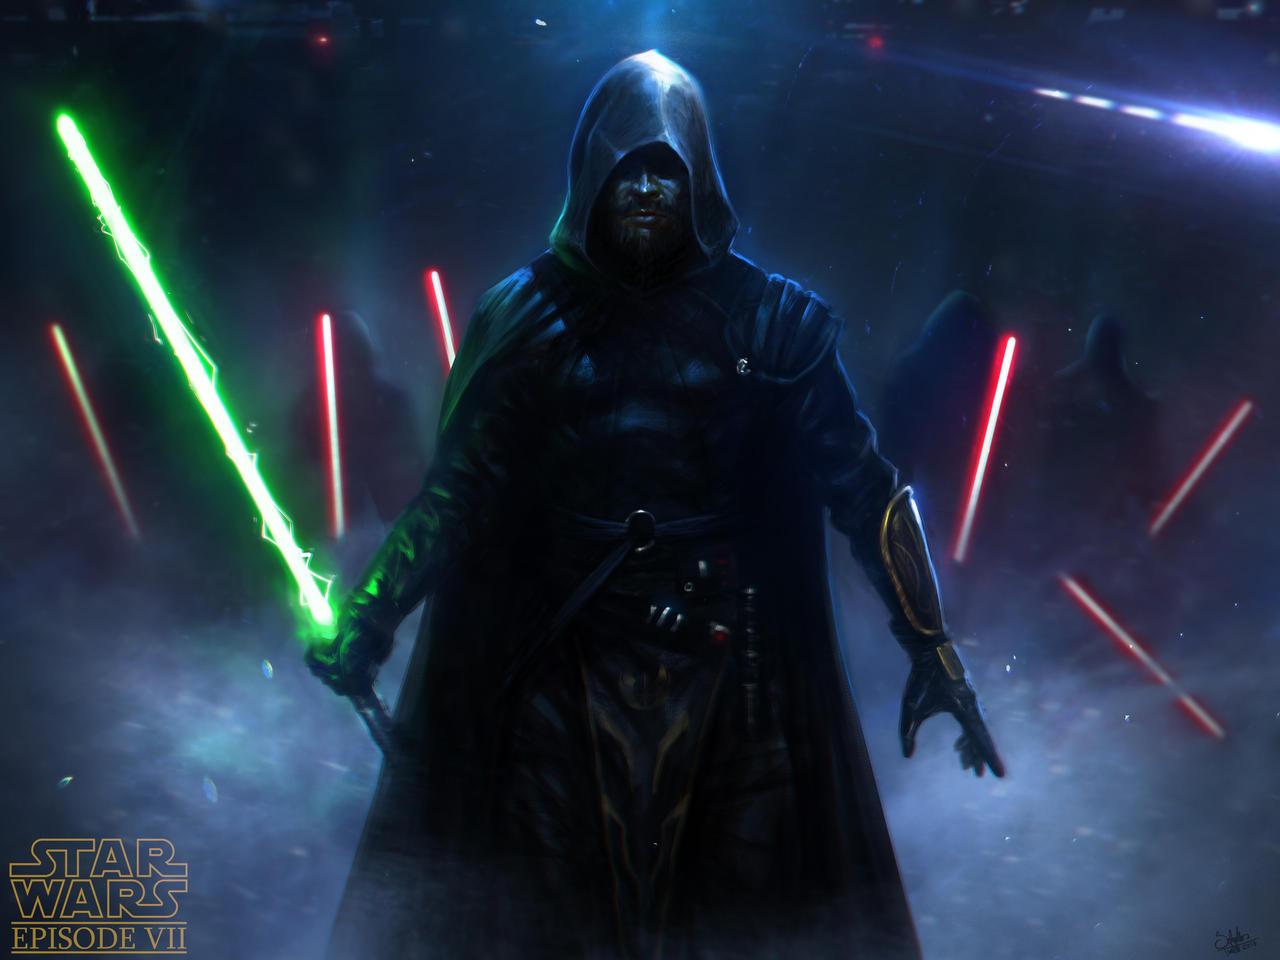 Luke Skywalker by SaturnoArg